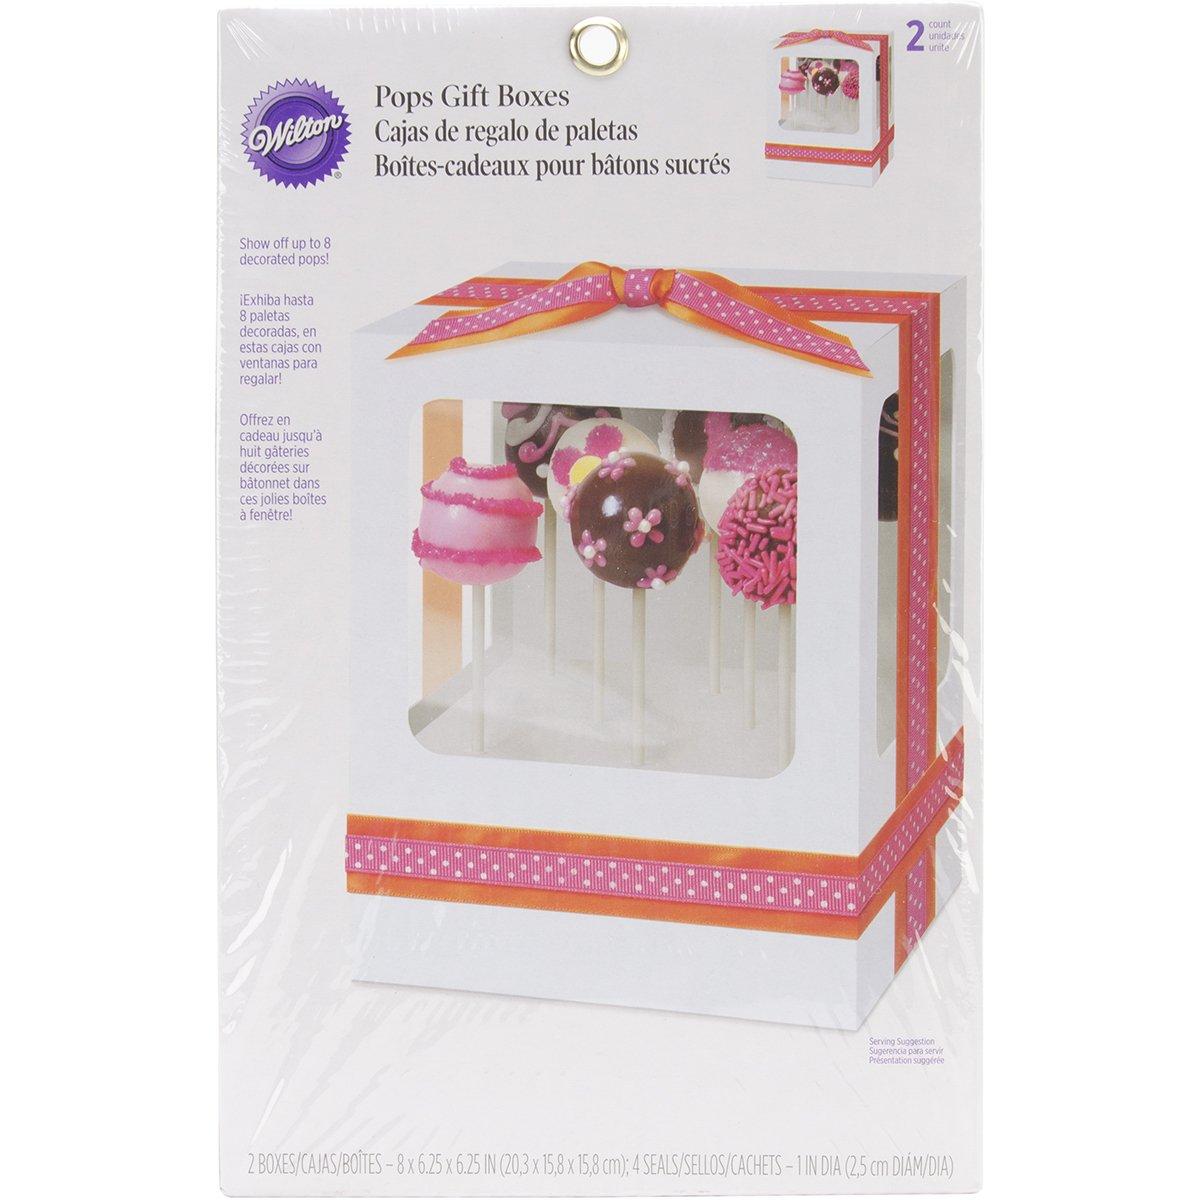 Amazon.com: Wilton 415-0577 12-Pack Valentine Single Pops Gift/Cake Box: Kitchen & Dining